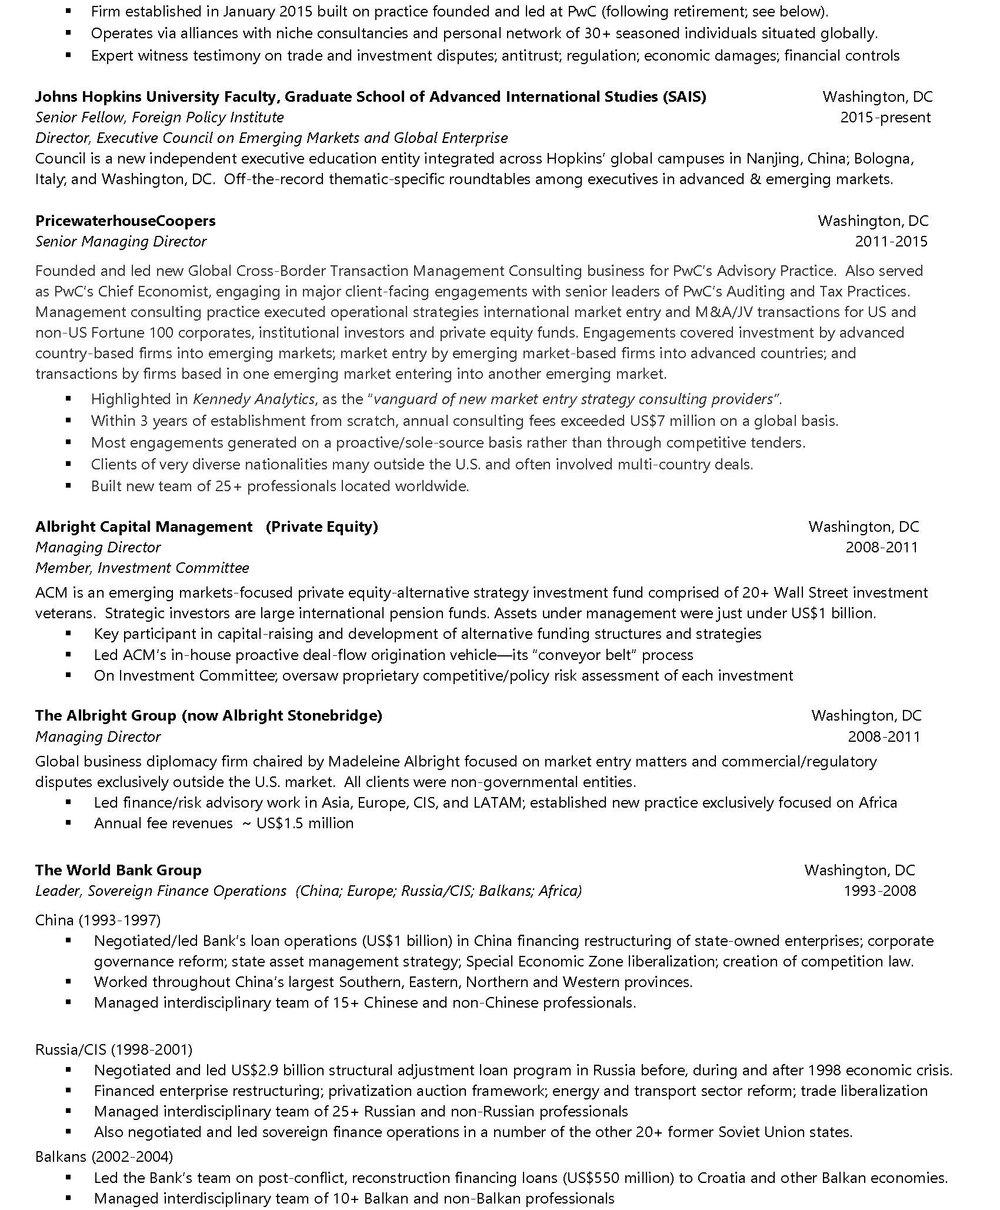 Broadman Detailed CV 5-7-18_Page_2.jpg